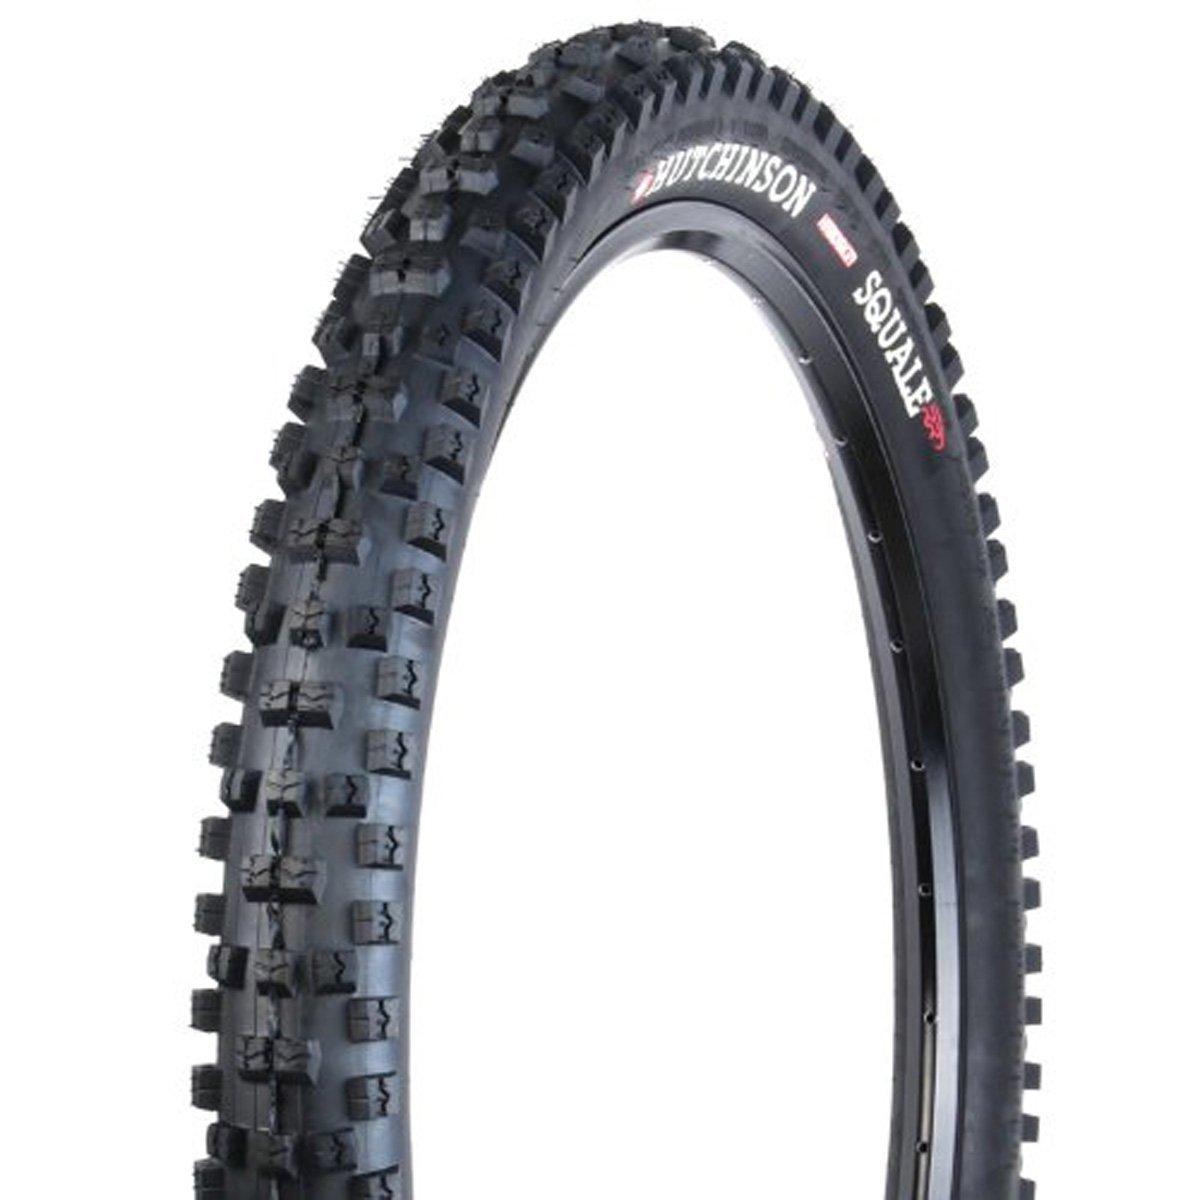 Hutchinson Squale HS Fold Tire Repair Kit 29 x 2.3 Black [並行輸入品] B077QH84VW